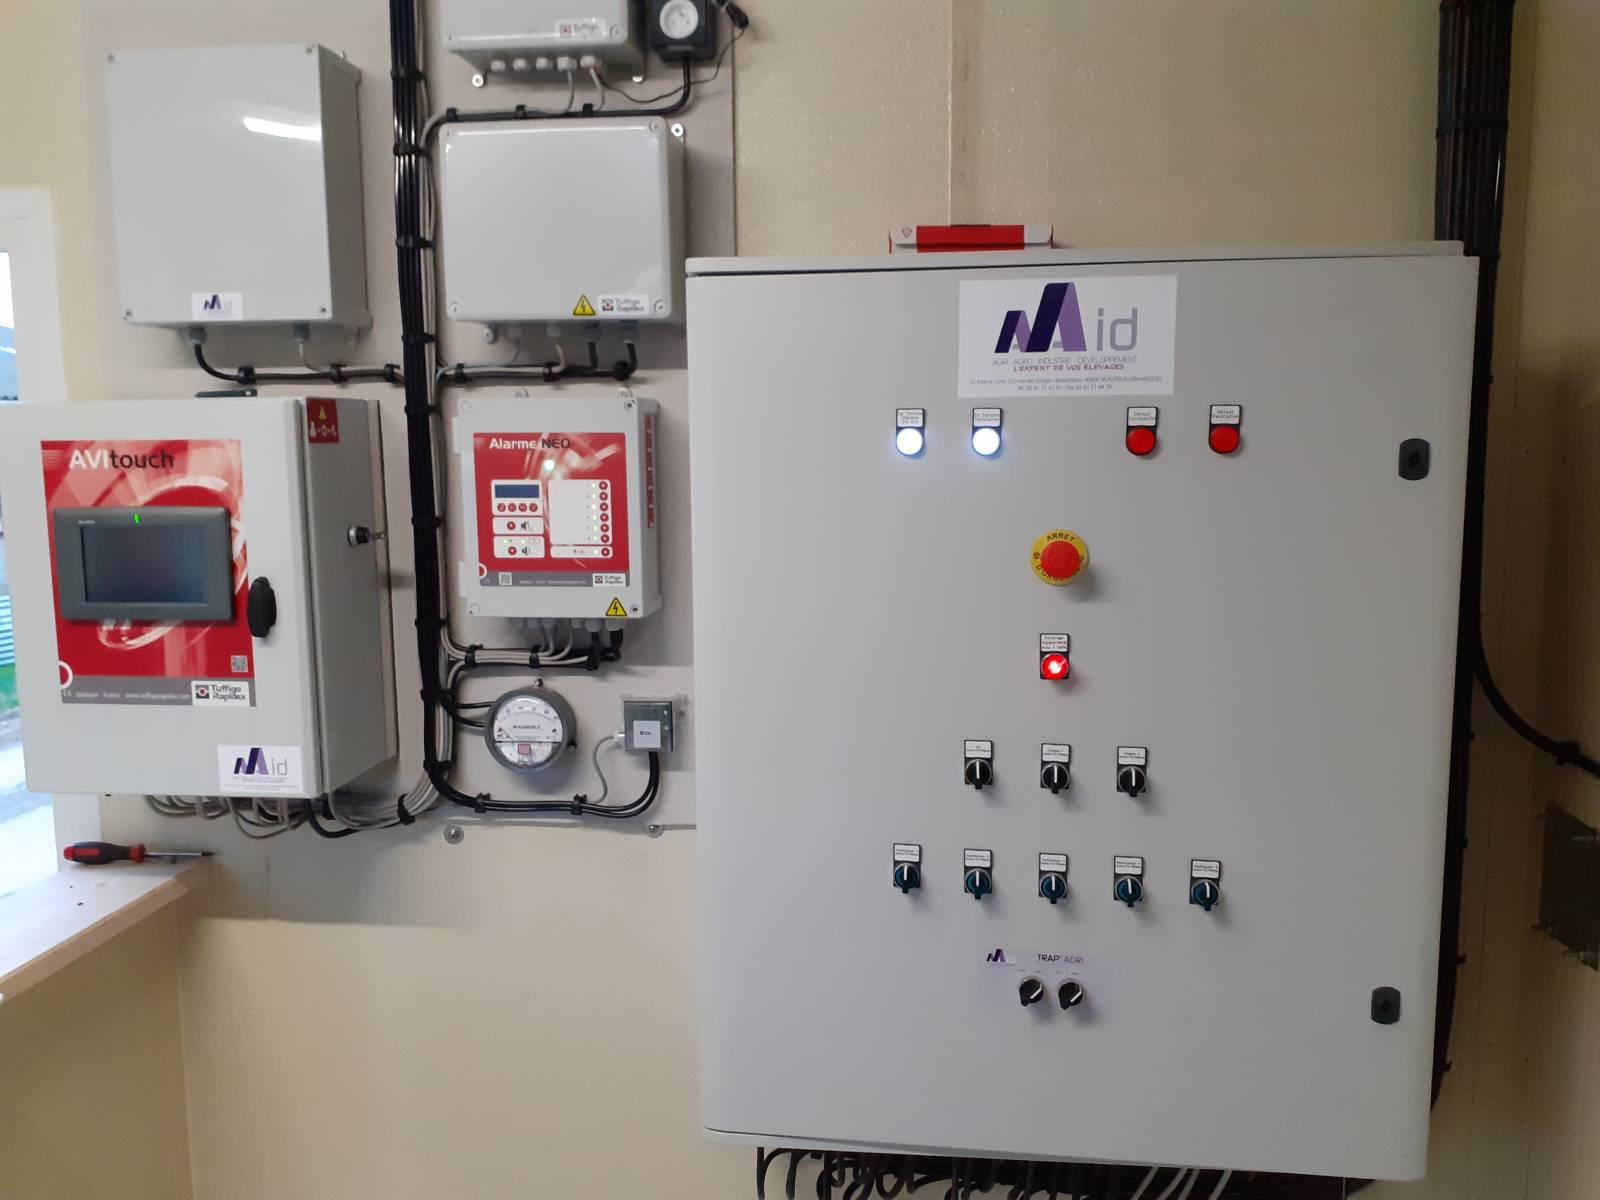 Armoire distribution - Régulation de ventilation - Alarme